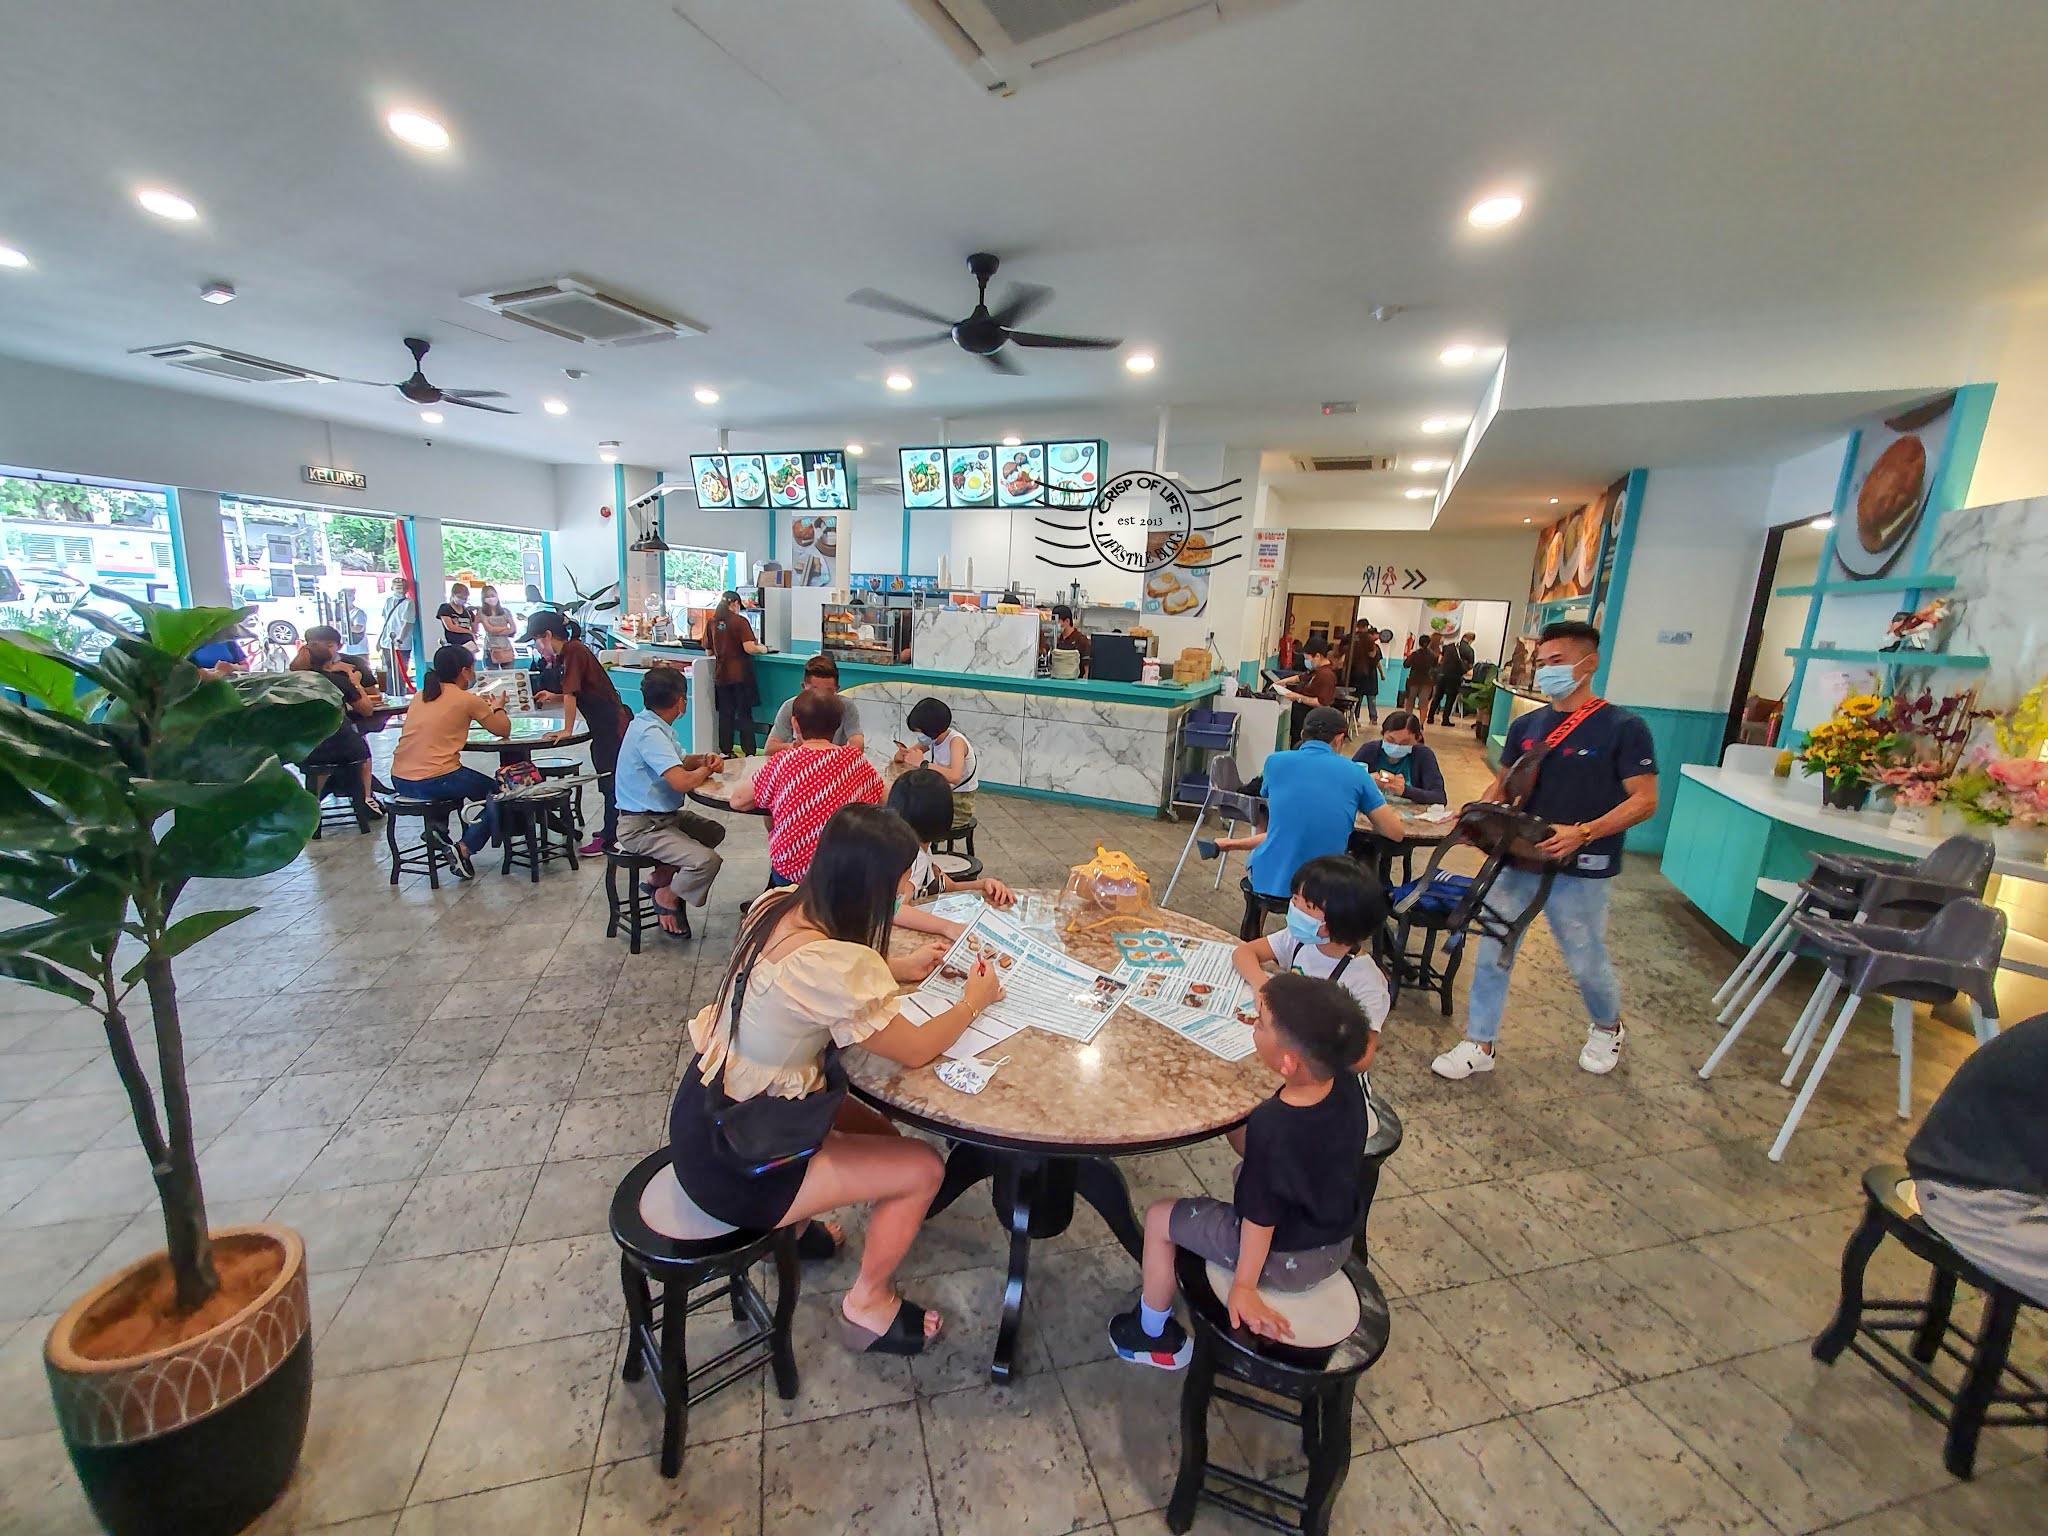 噢噢白咖啡屋OO White Coffee Cafe @ Waterfall Hotel, Jalan Gottlieb Penang